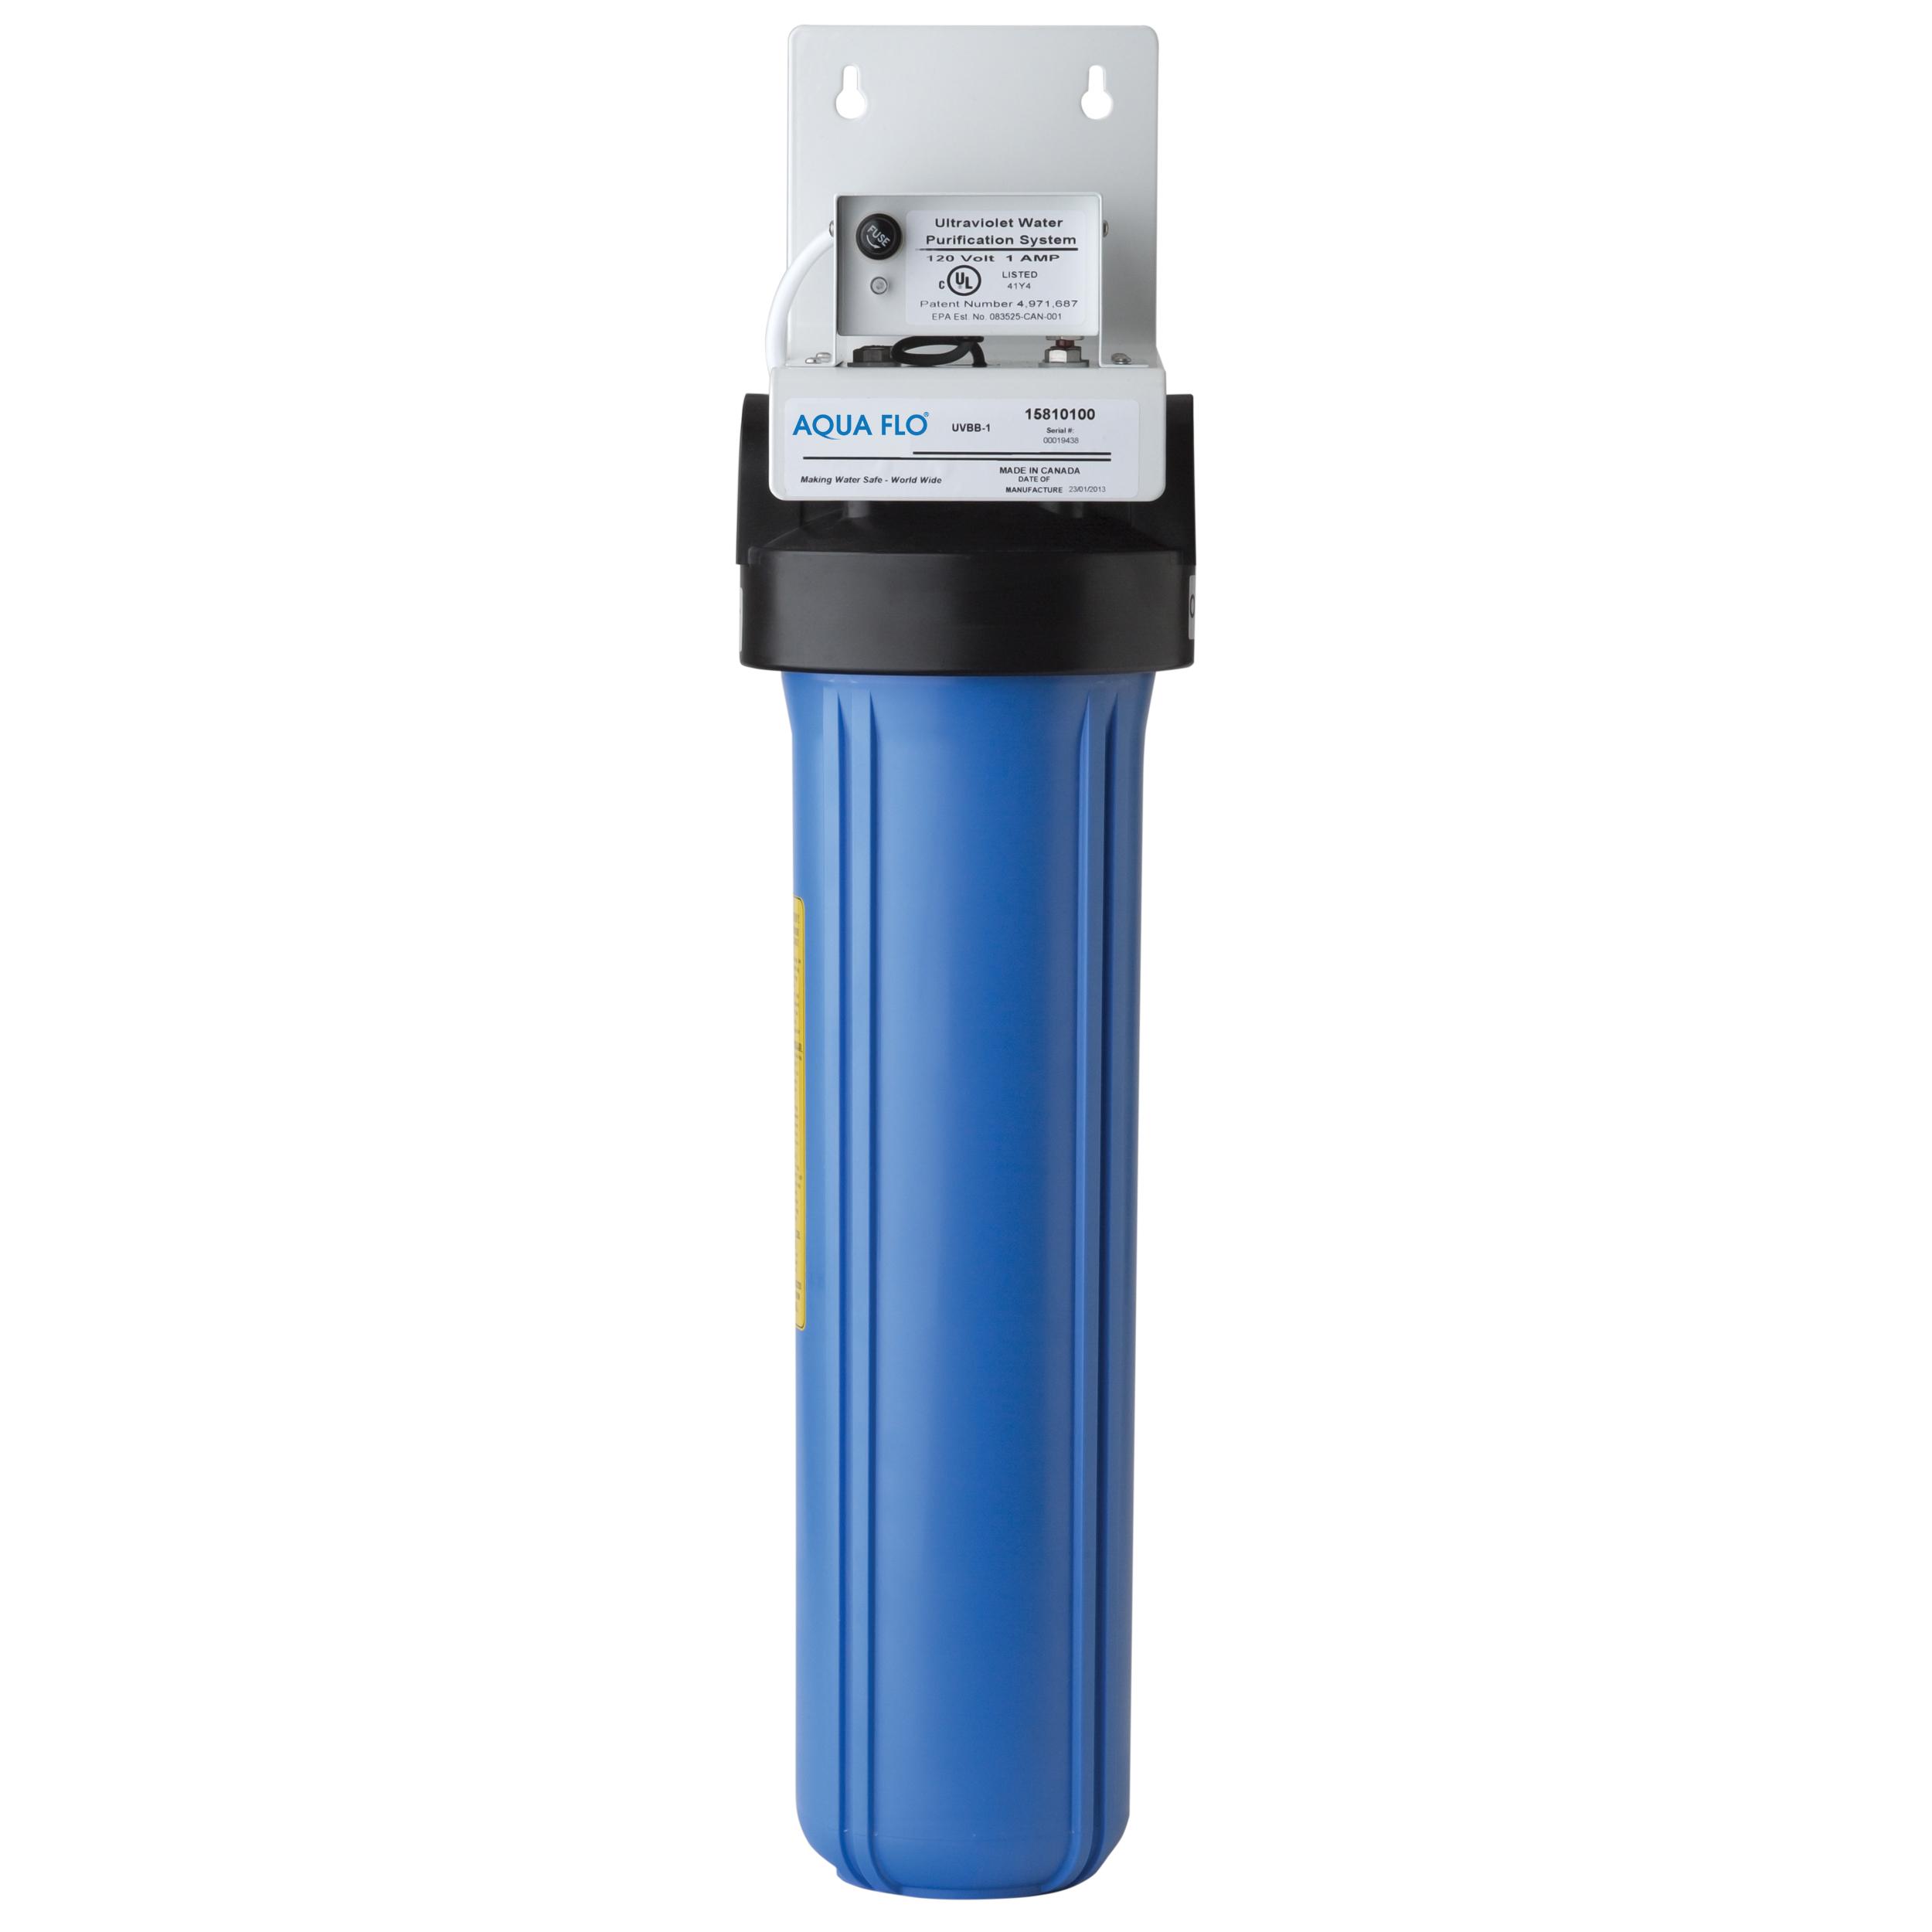 Aqua Flo UV BigBoy-1.jpg